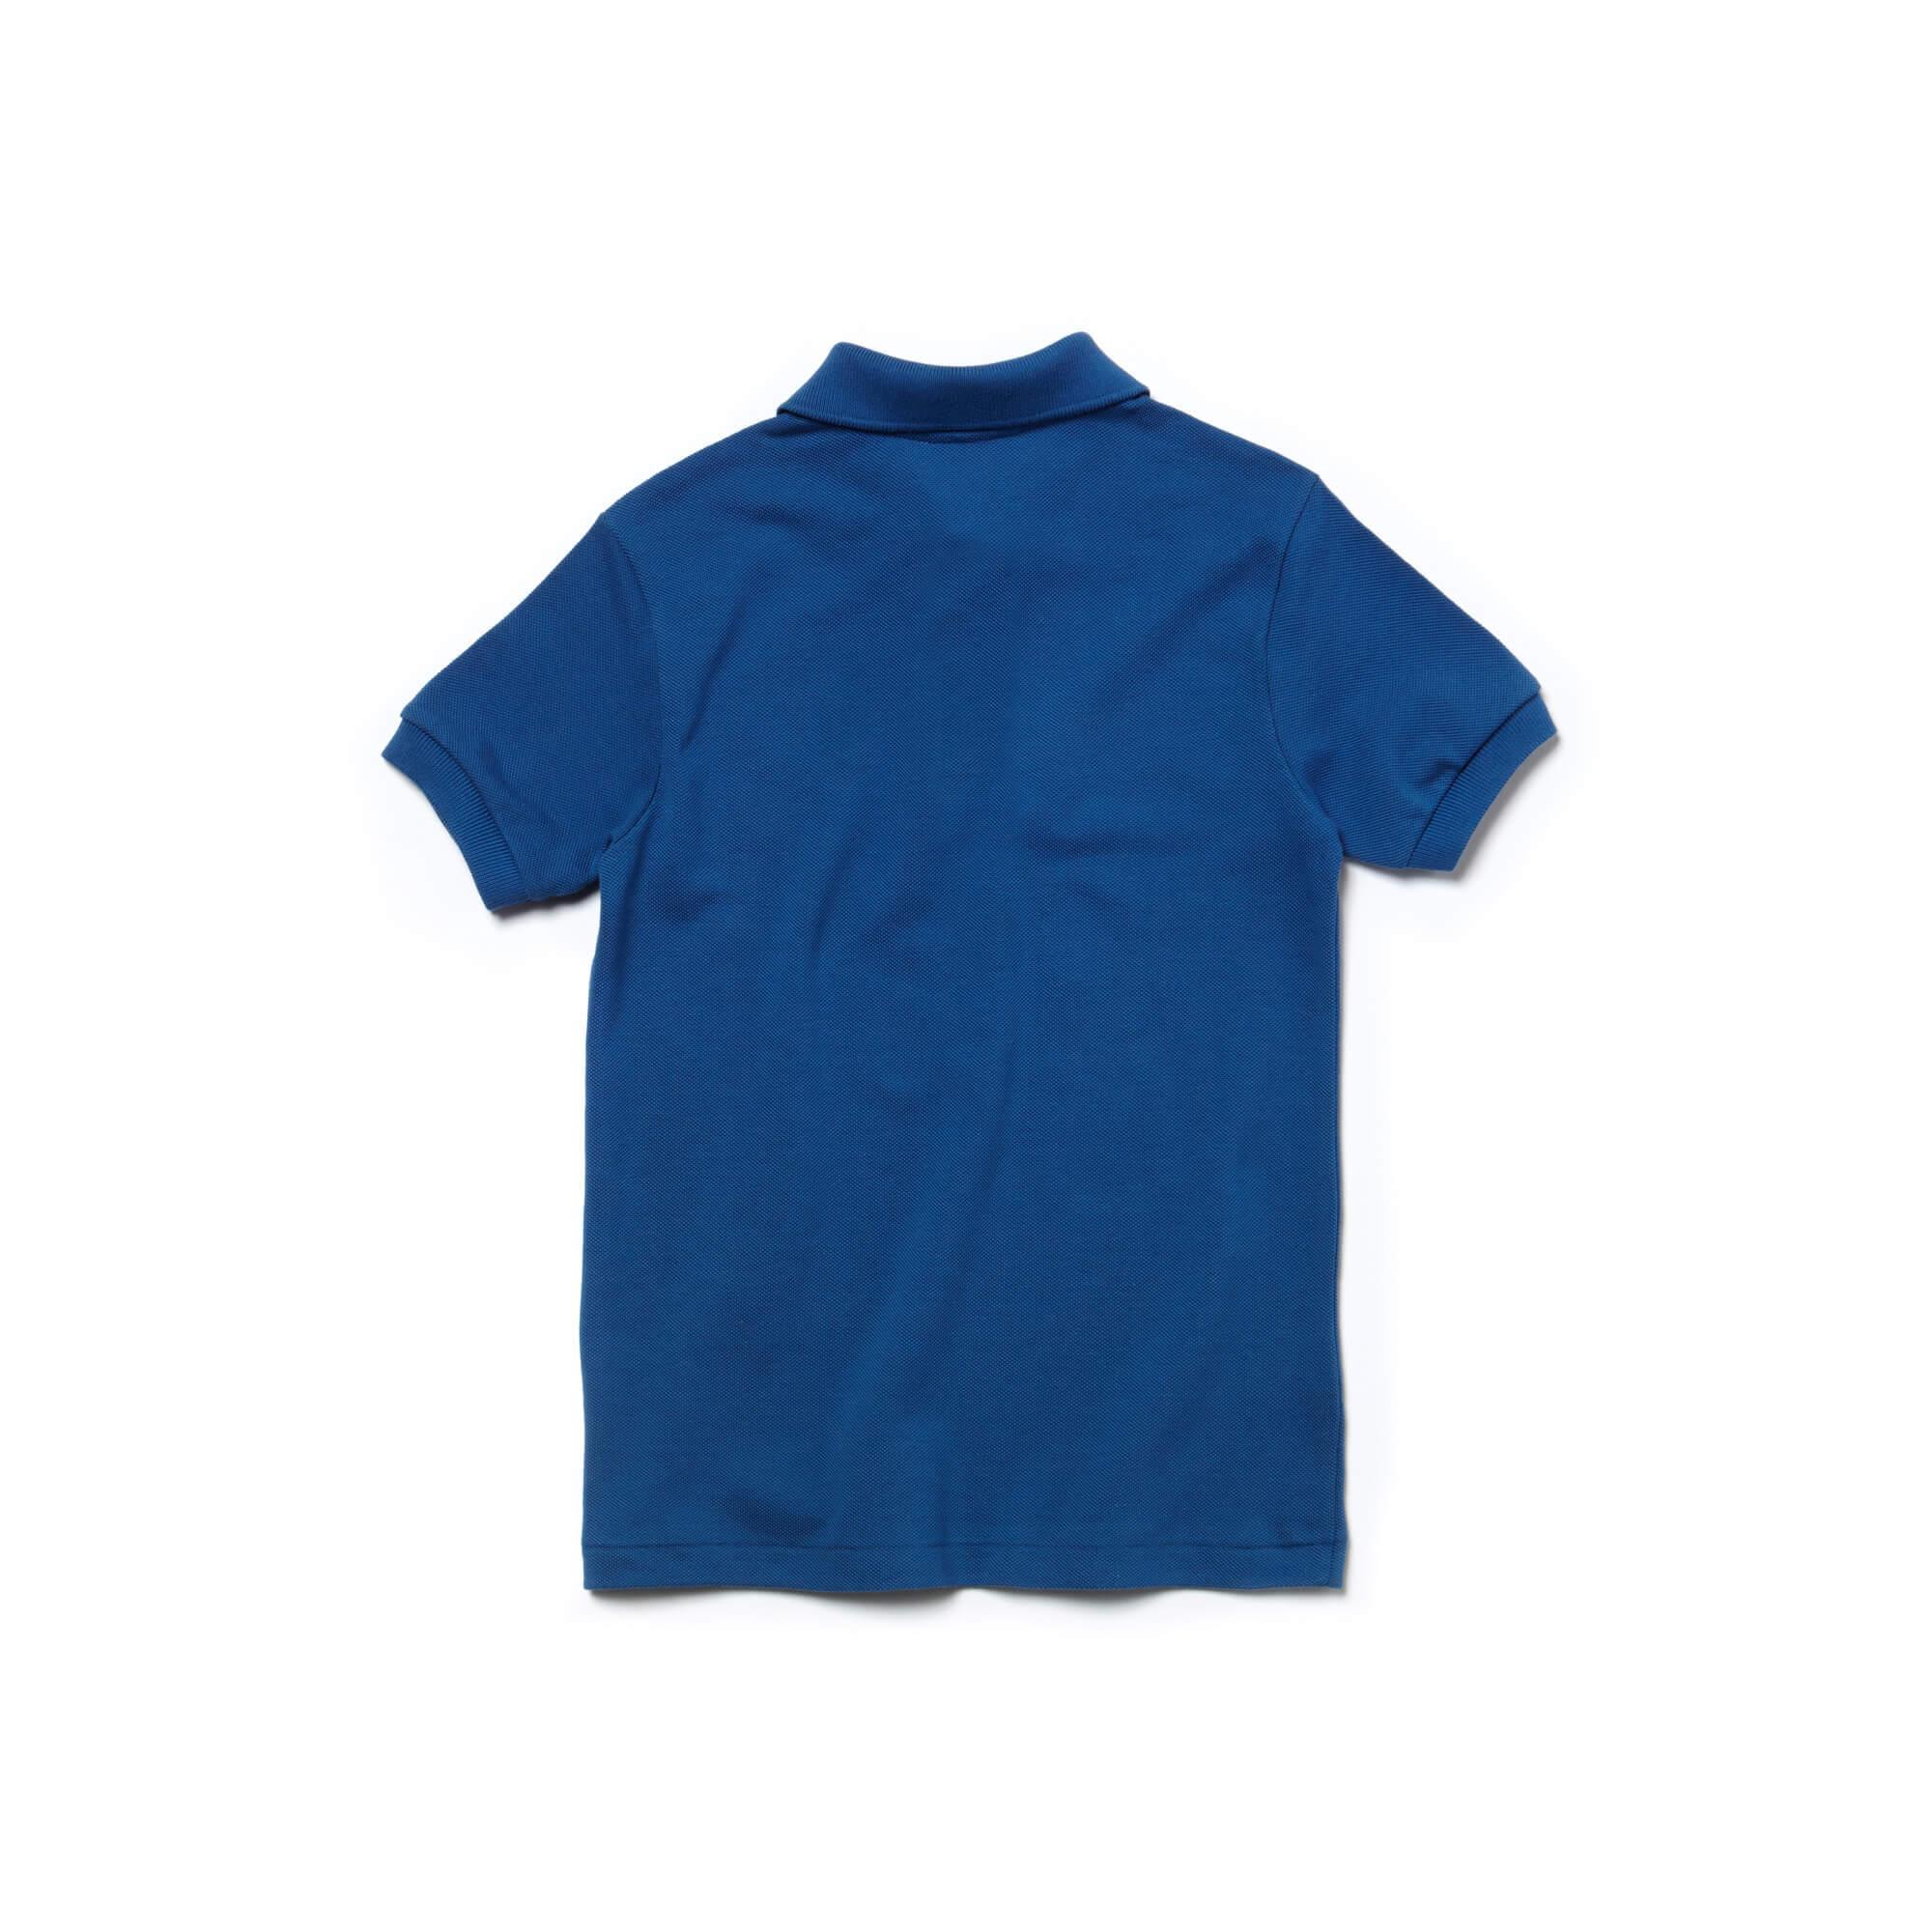 Lacoste Kids' Short Sleeve Polo